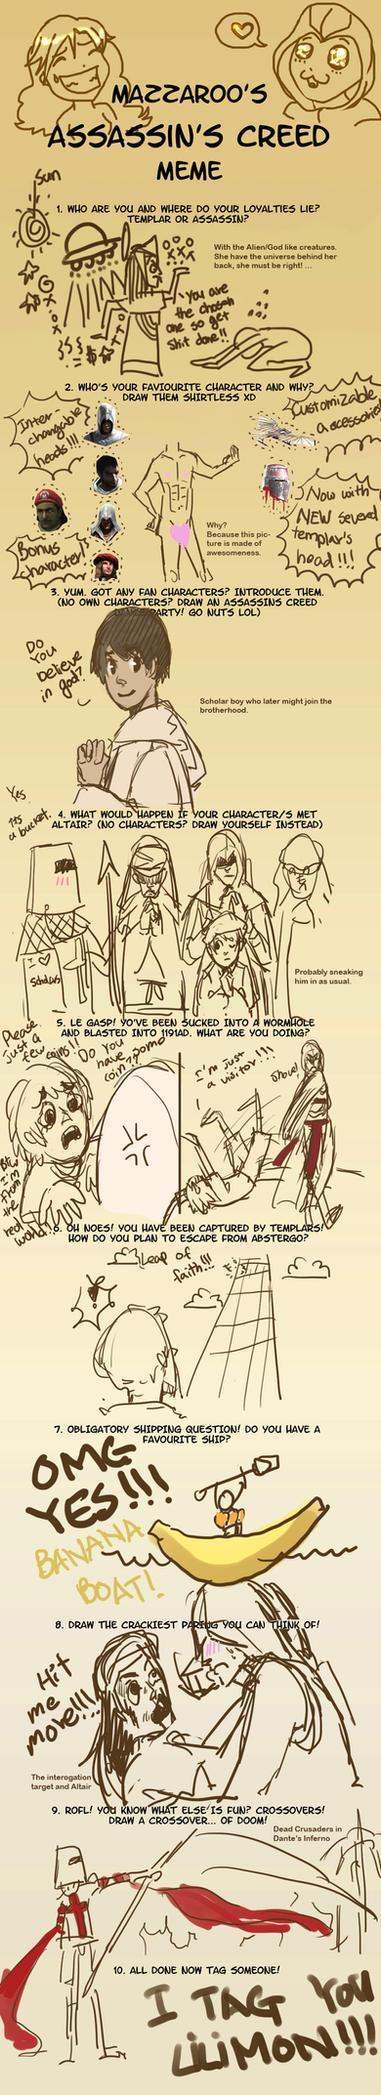 Assassins Creed Meme by Hotara